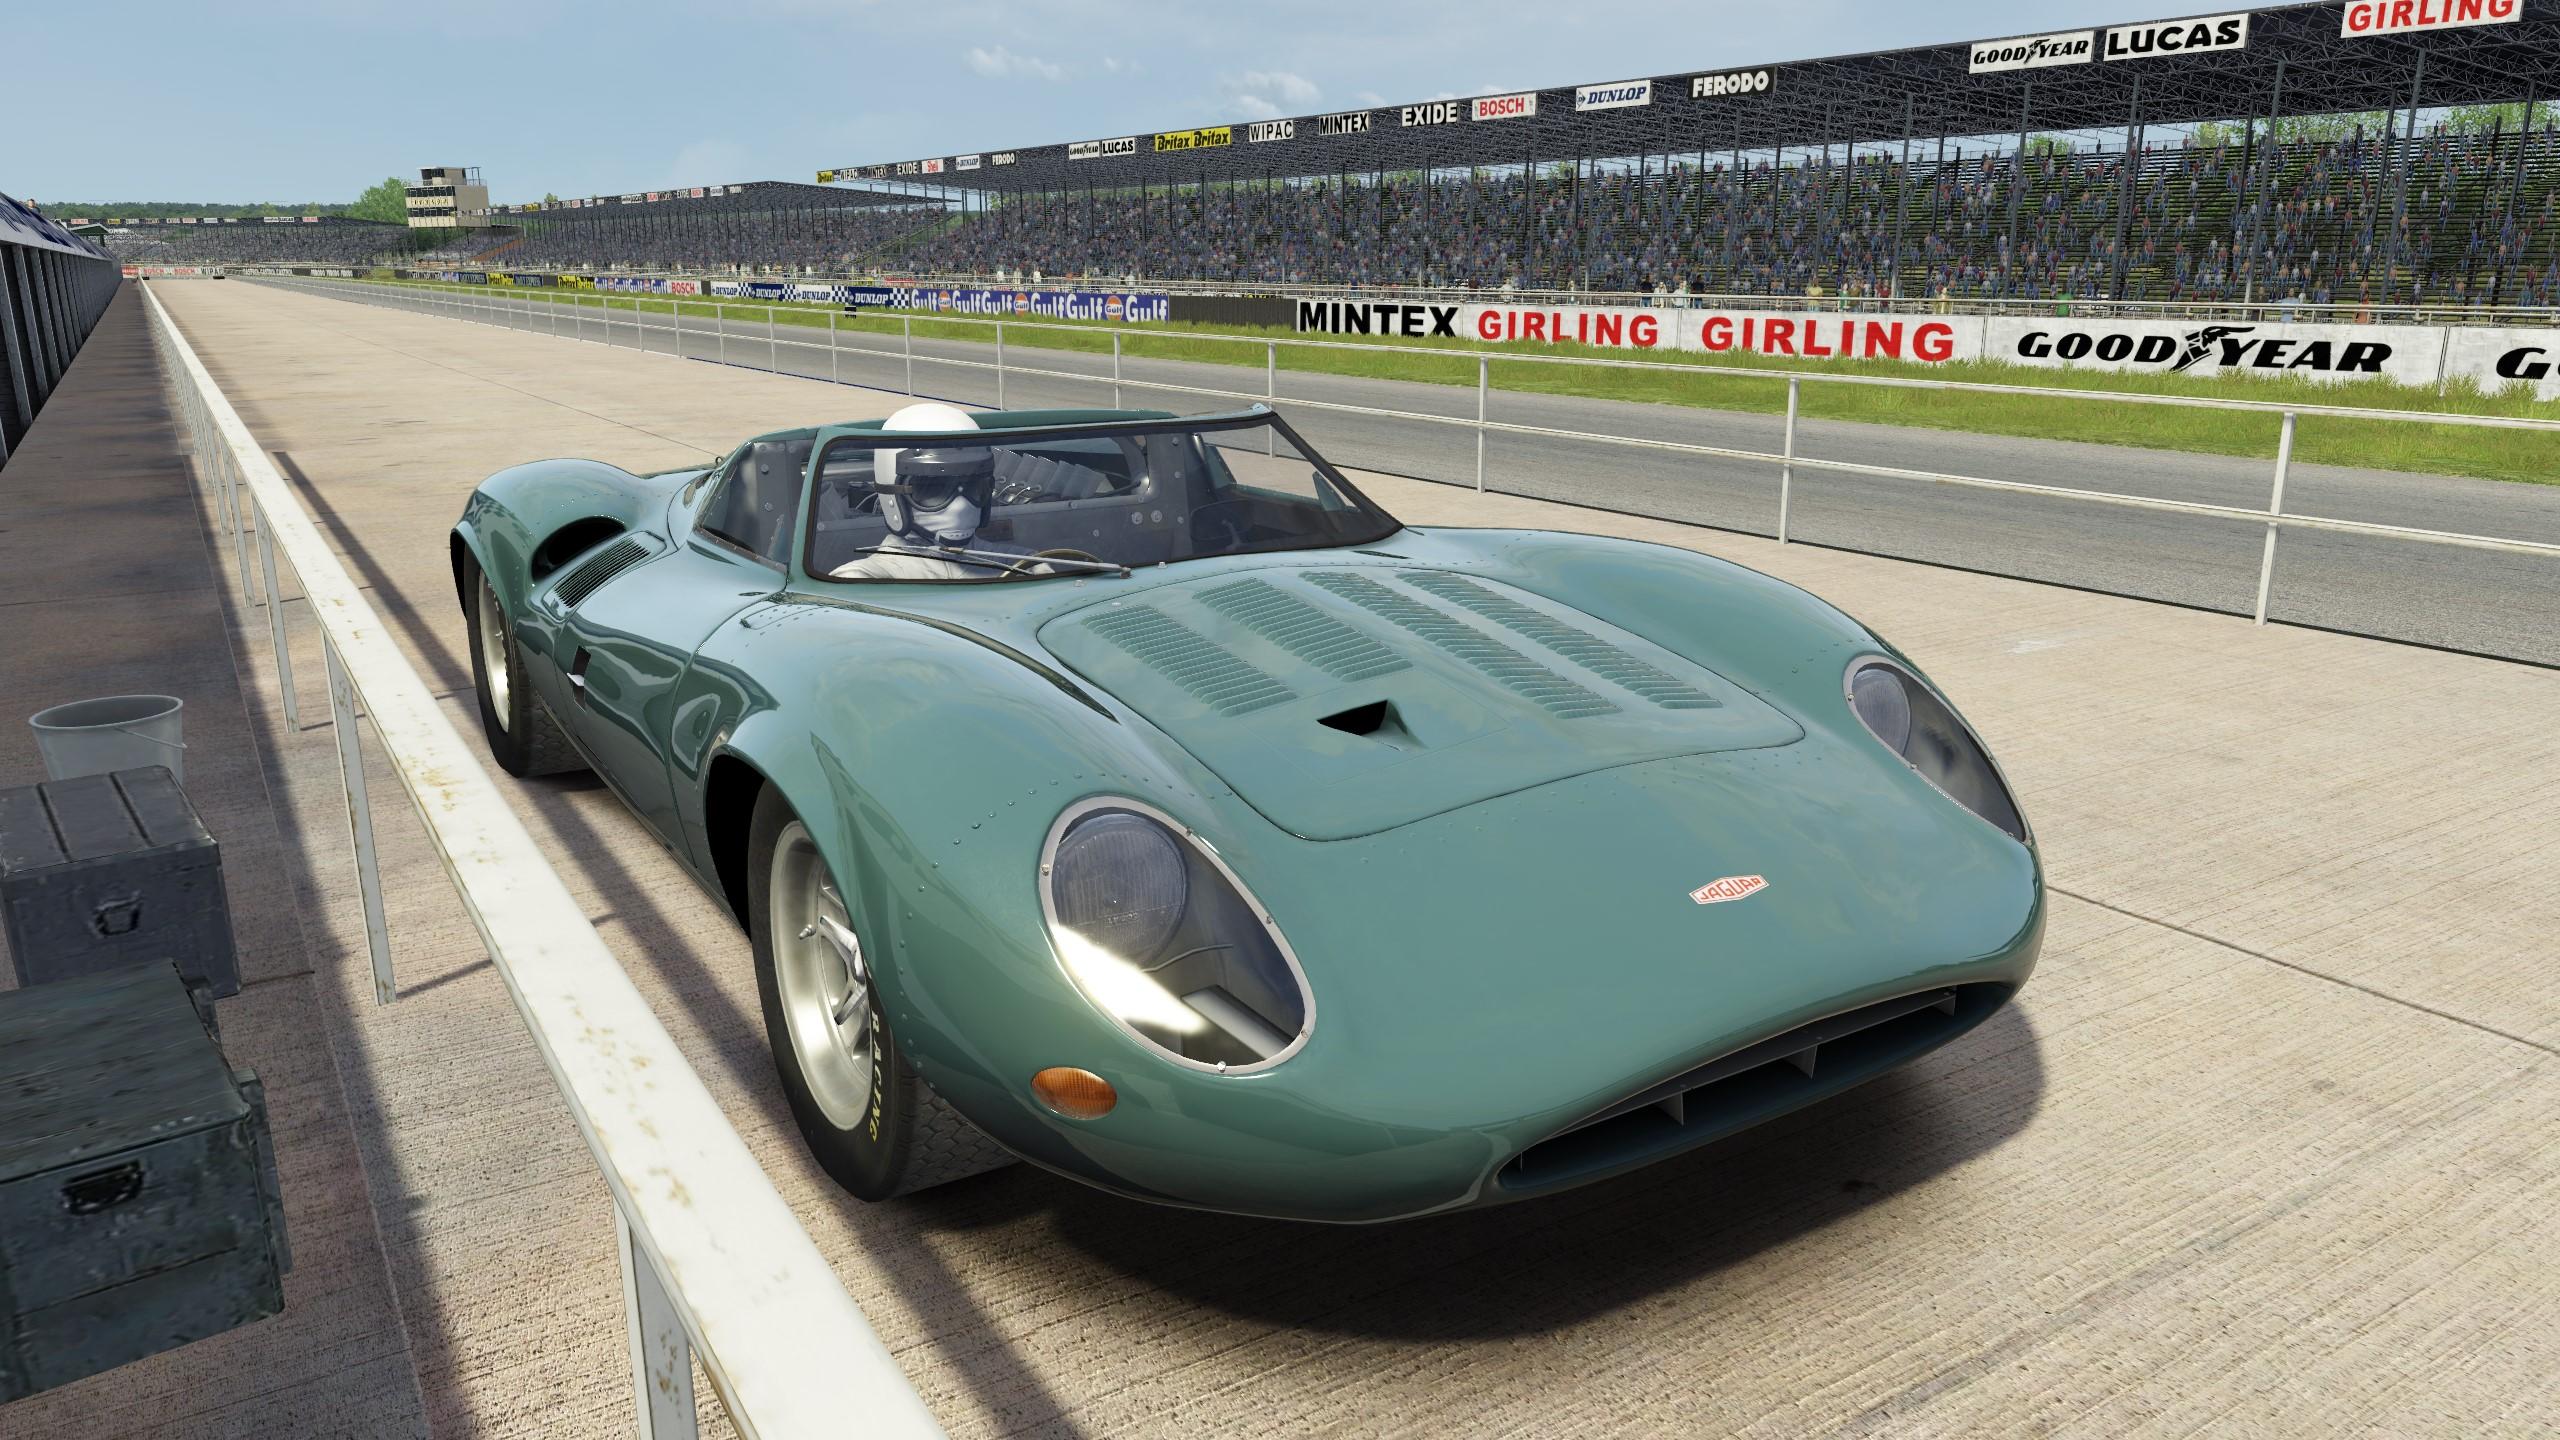 Cars - Jaguar XJ13 Deleted | RaceDepartment